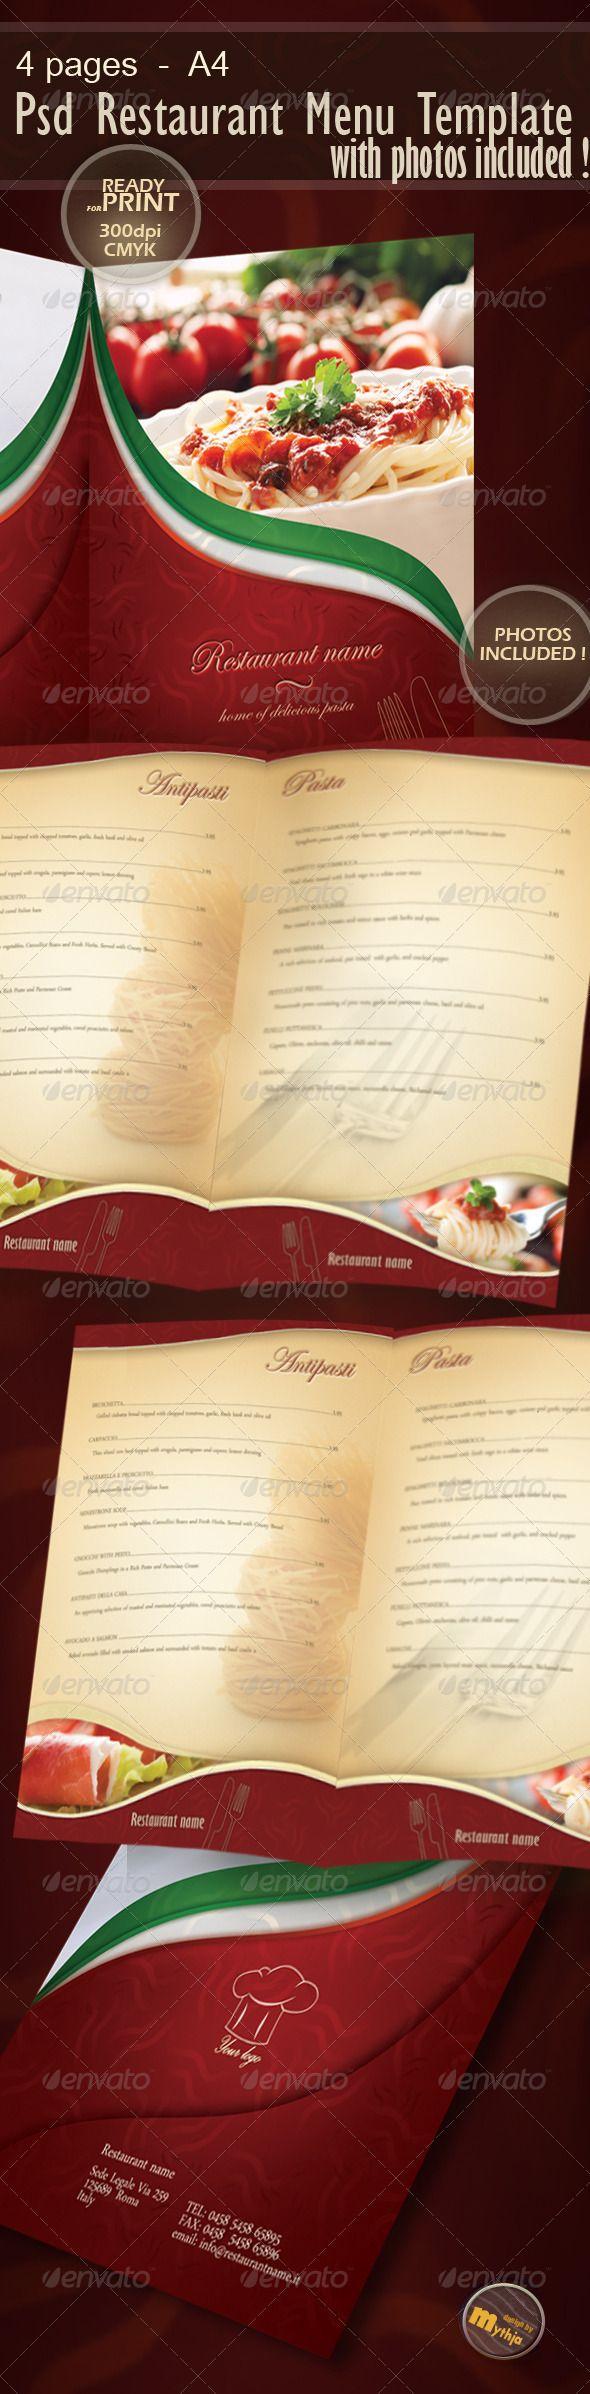 Restaurant Menu Template With Photos Incuded  Menu Templates